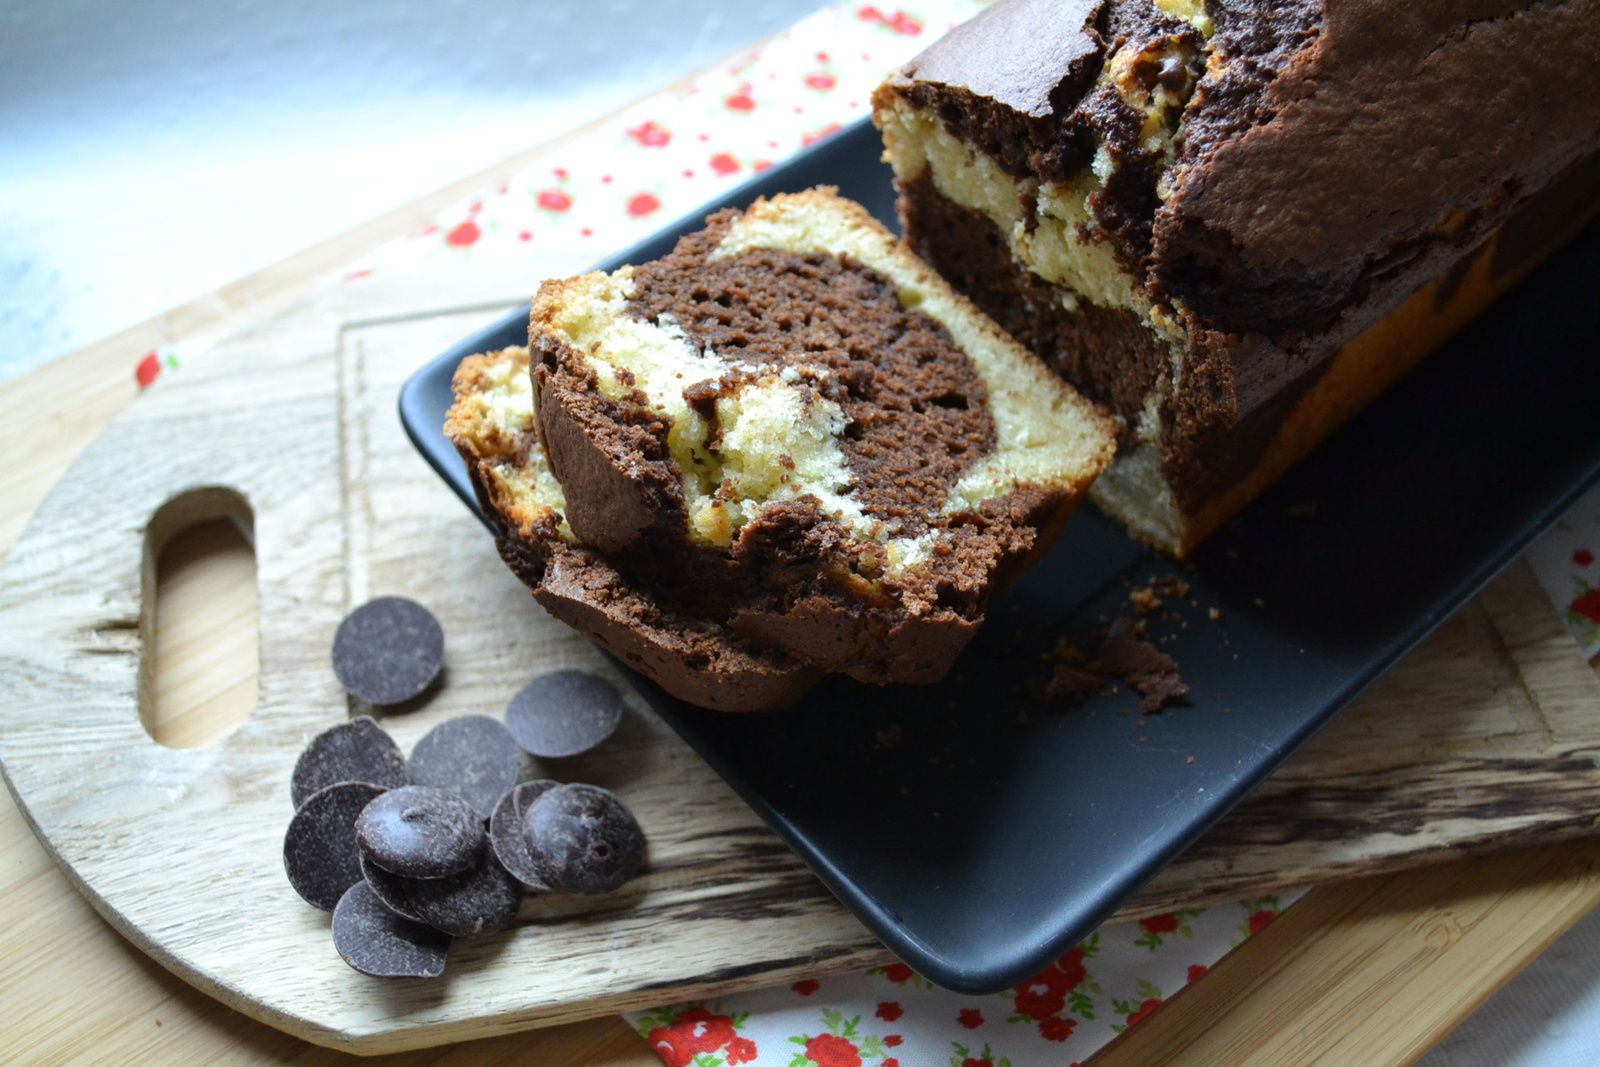 Le cake marbré de Carole